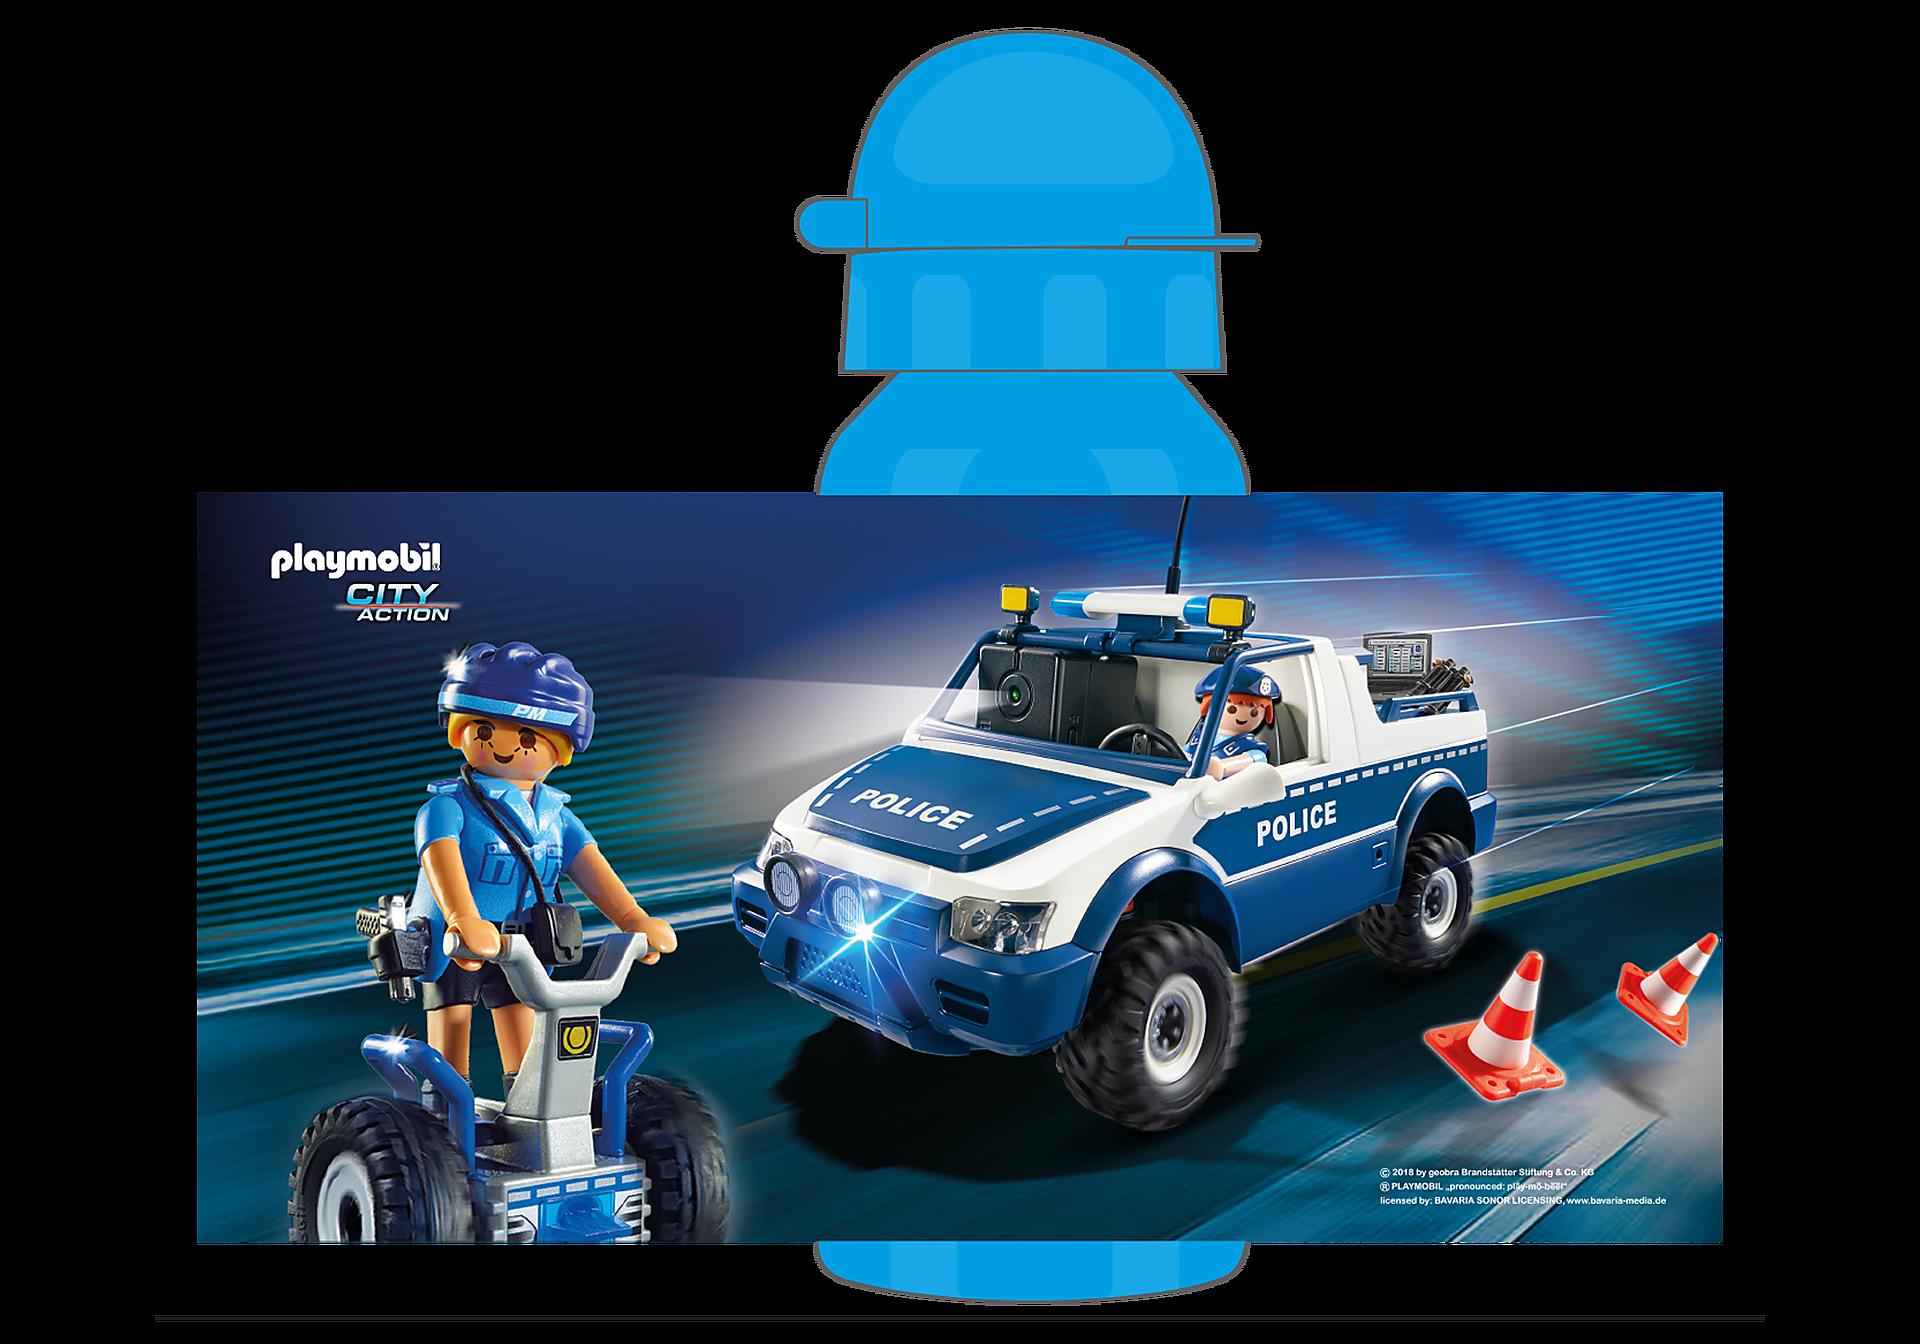 http://media.playmobil.com/i/playmobil/80496_product_detail/Playmobil Flasche Polizei